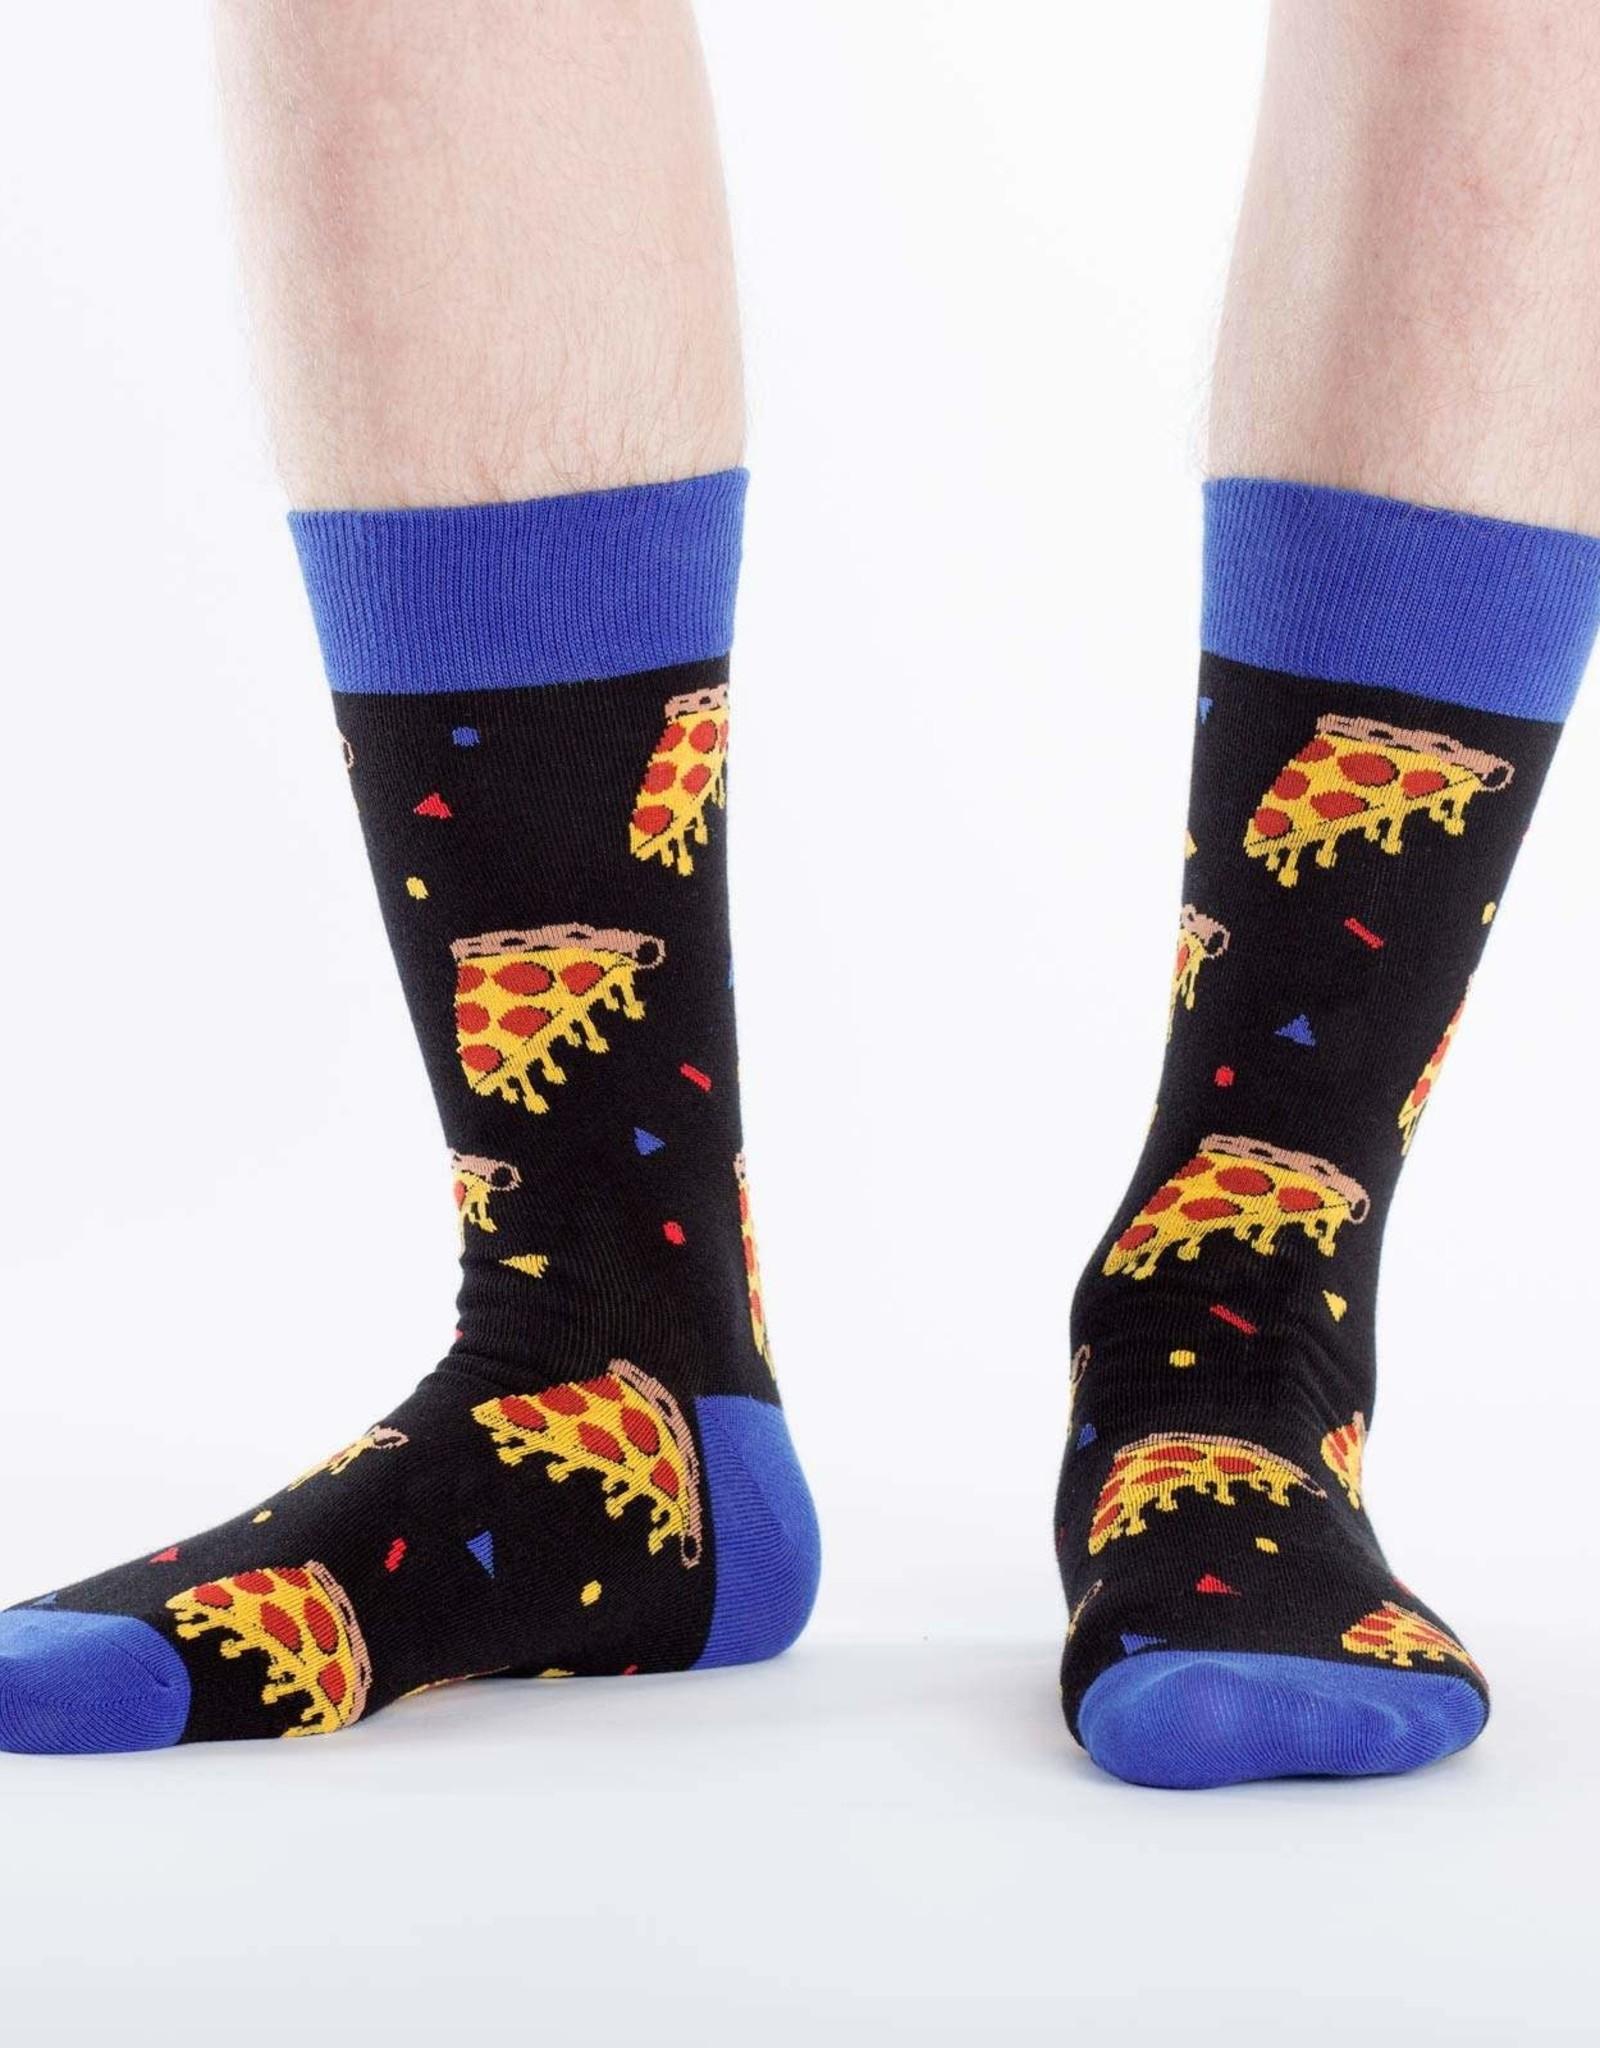 Sock It To Me MEN'S CREW: PIZZA PARTY